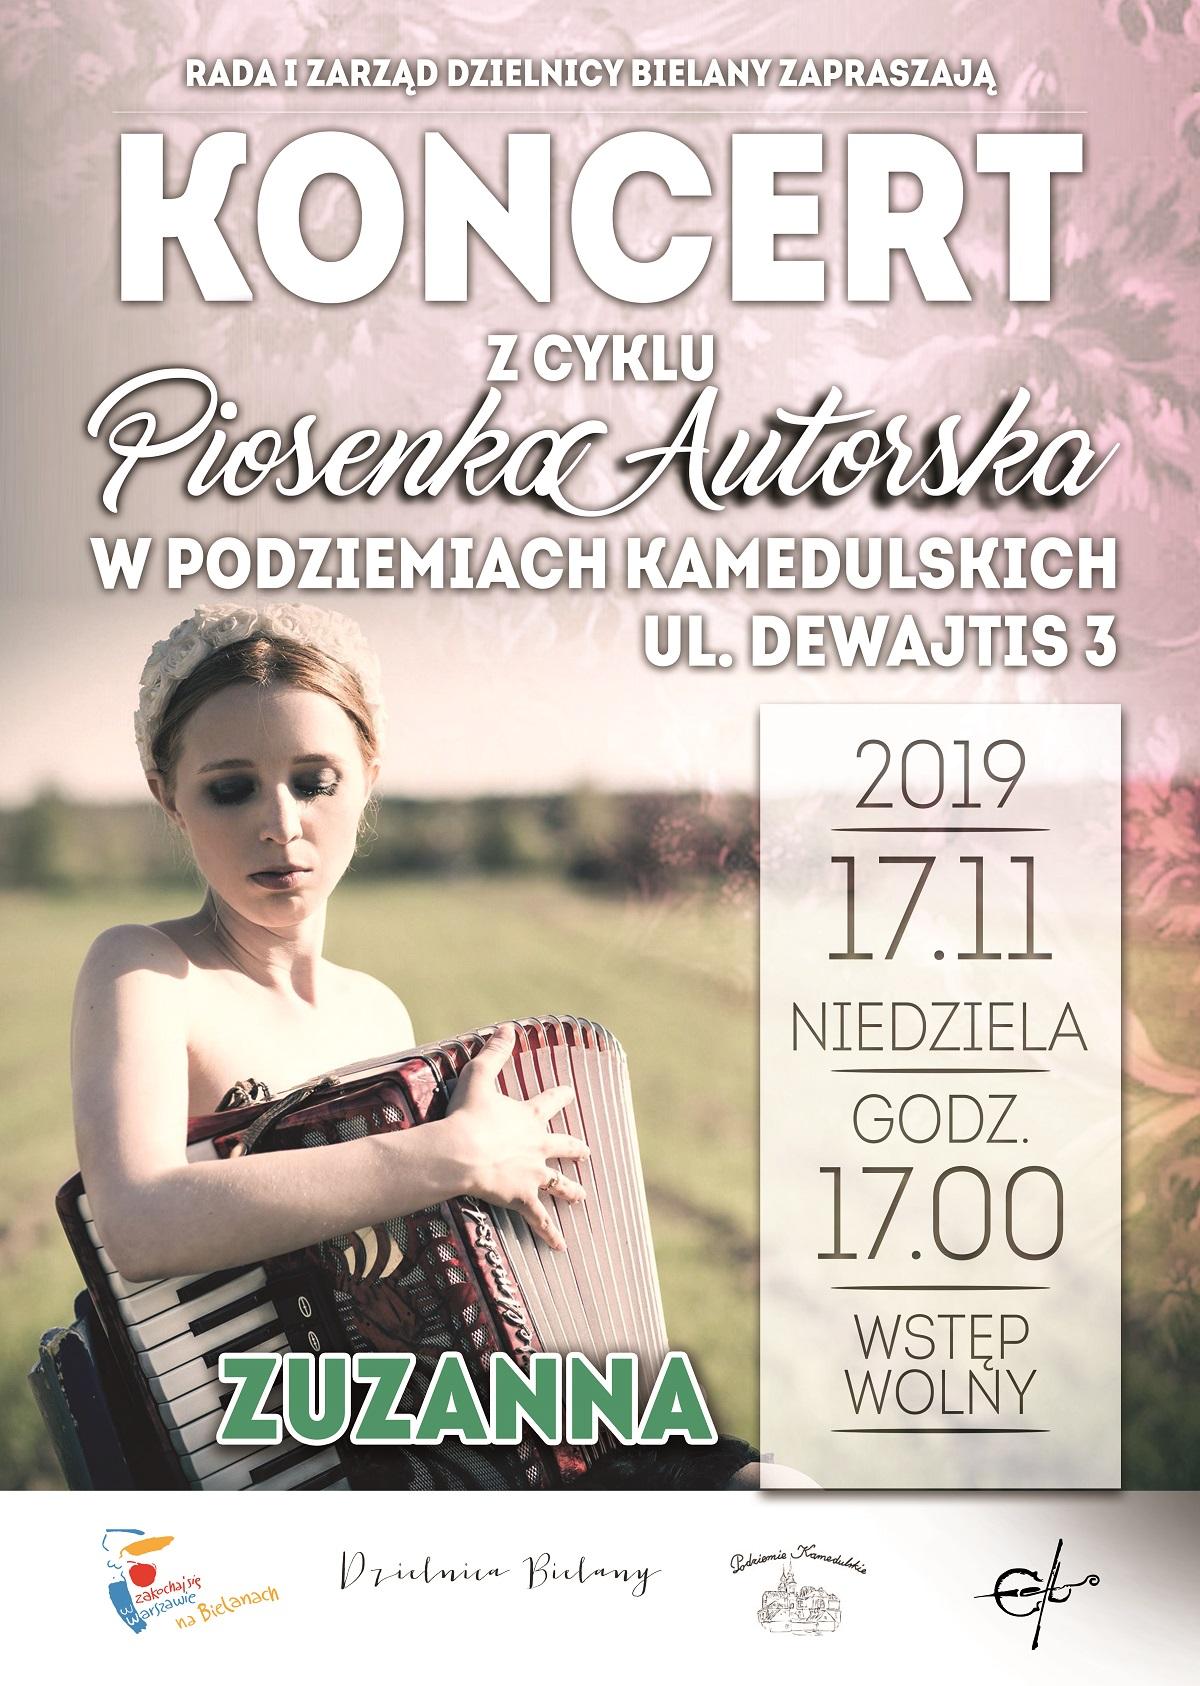 zuzanna_piosenka_autorska